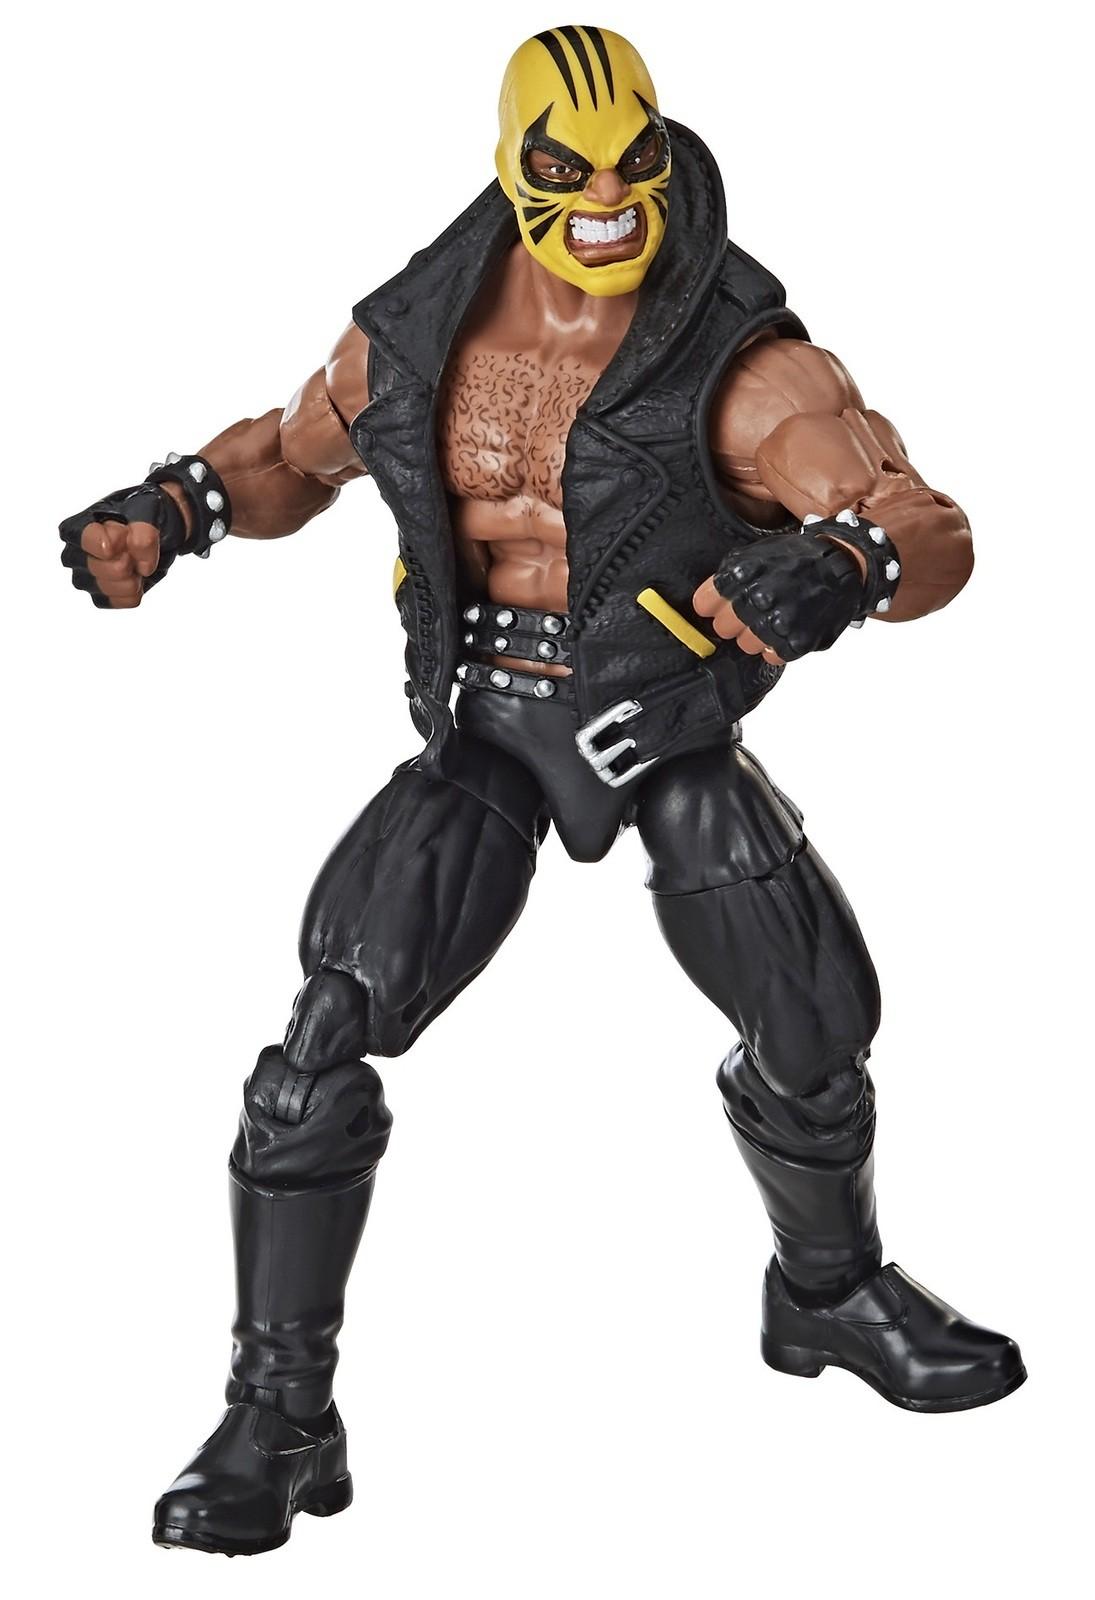 Action Figure Marvel's Rage: Marvel Legends Series E9677 - Hasbro